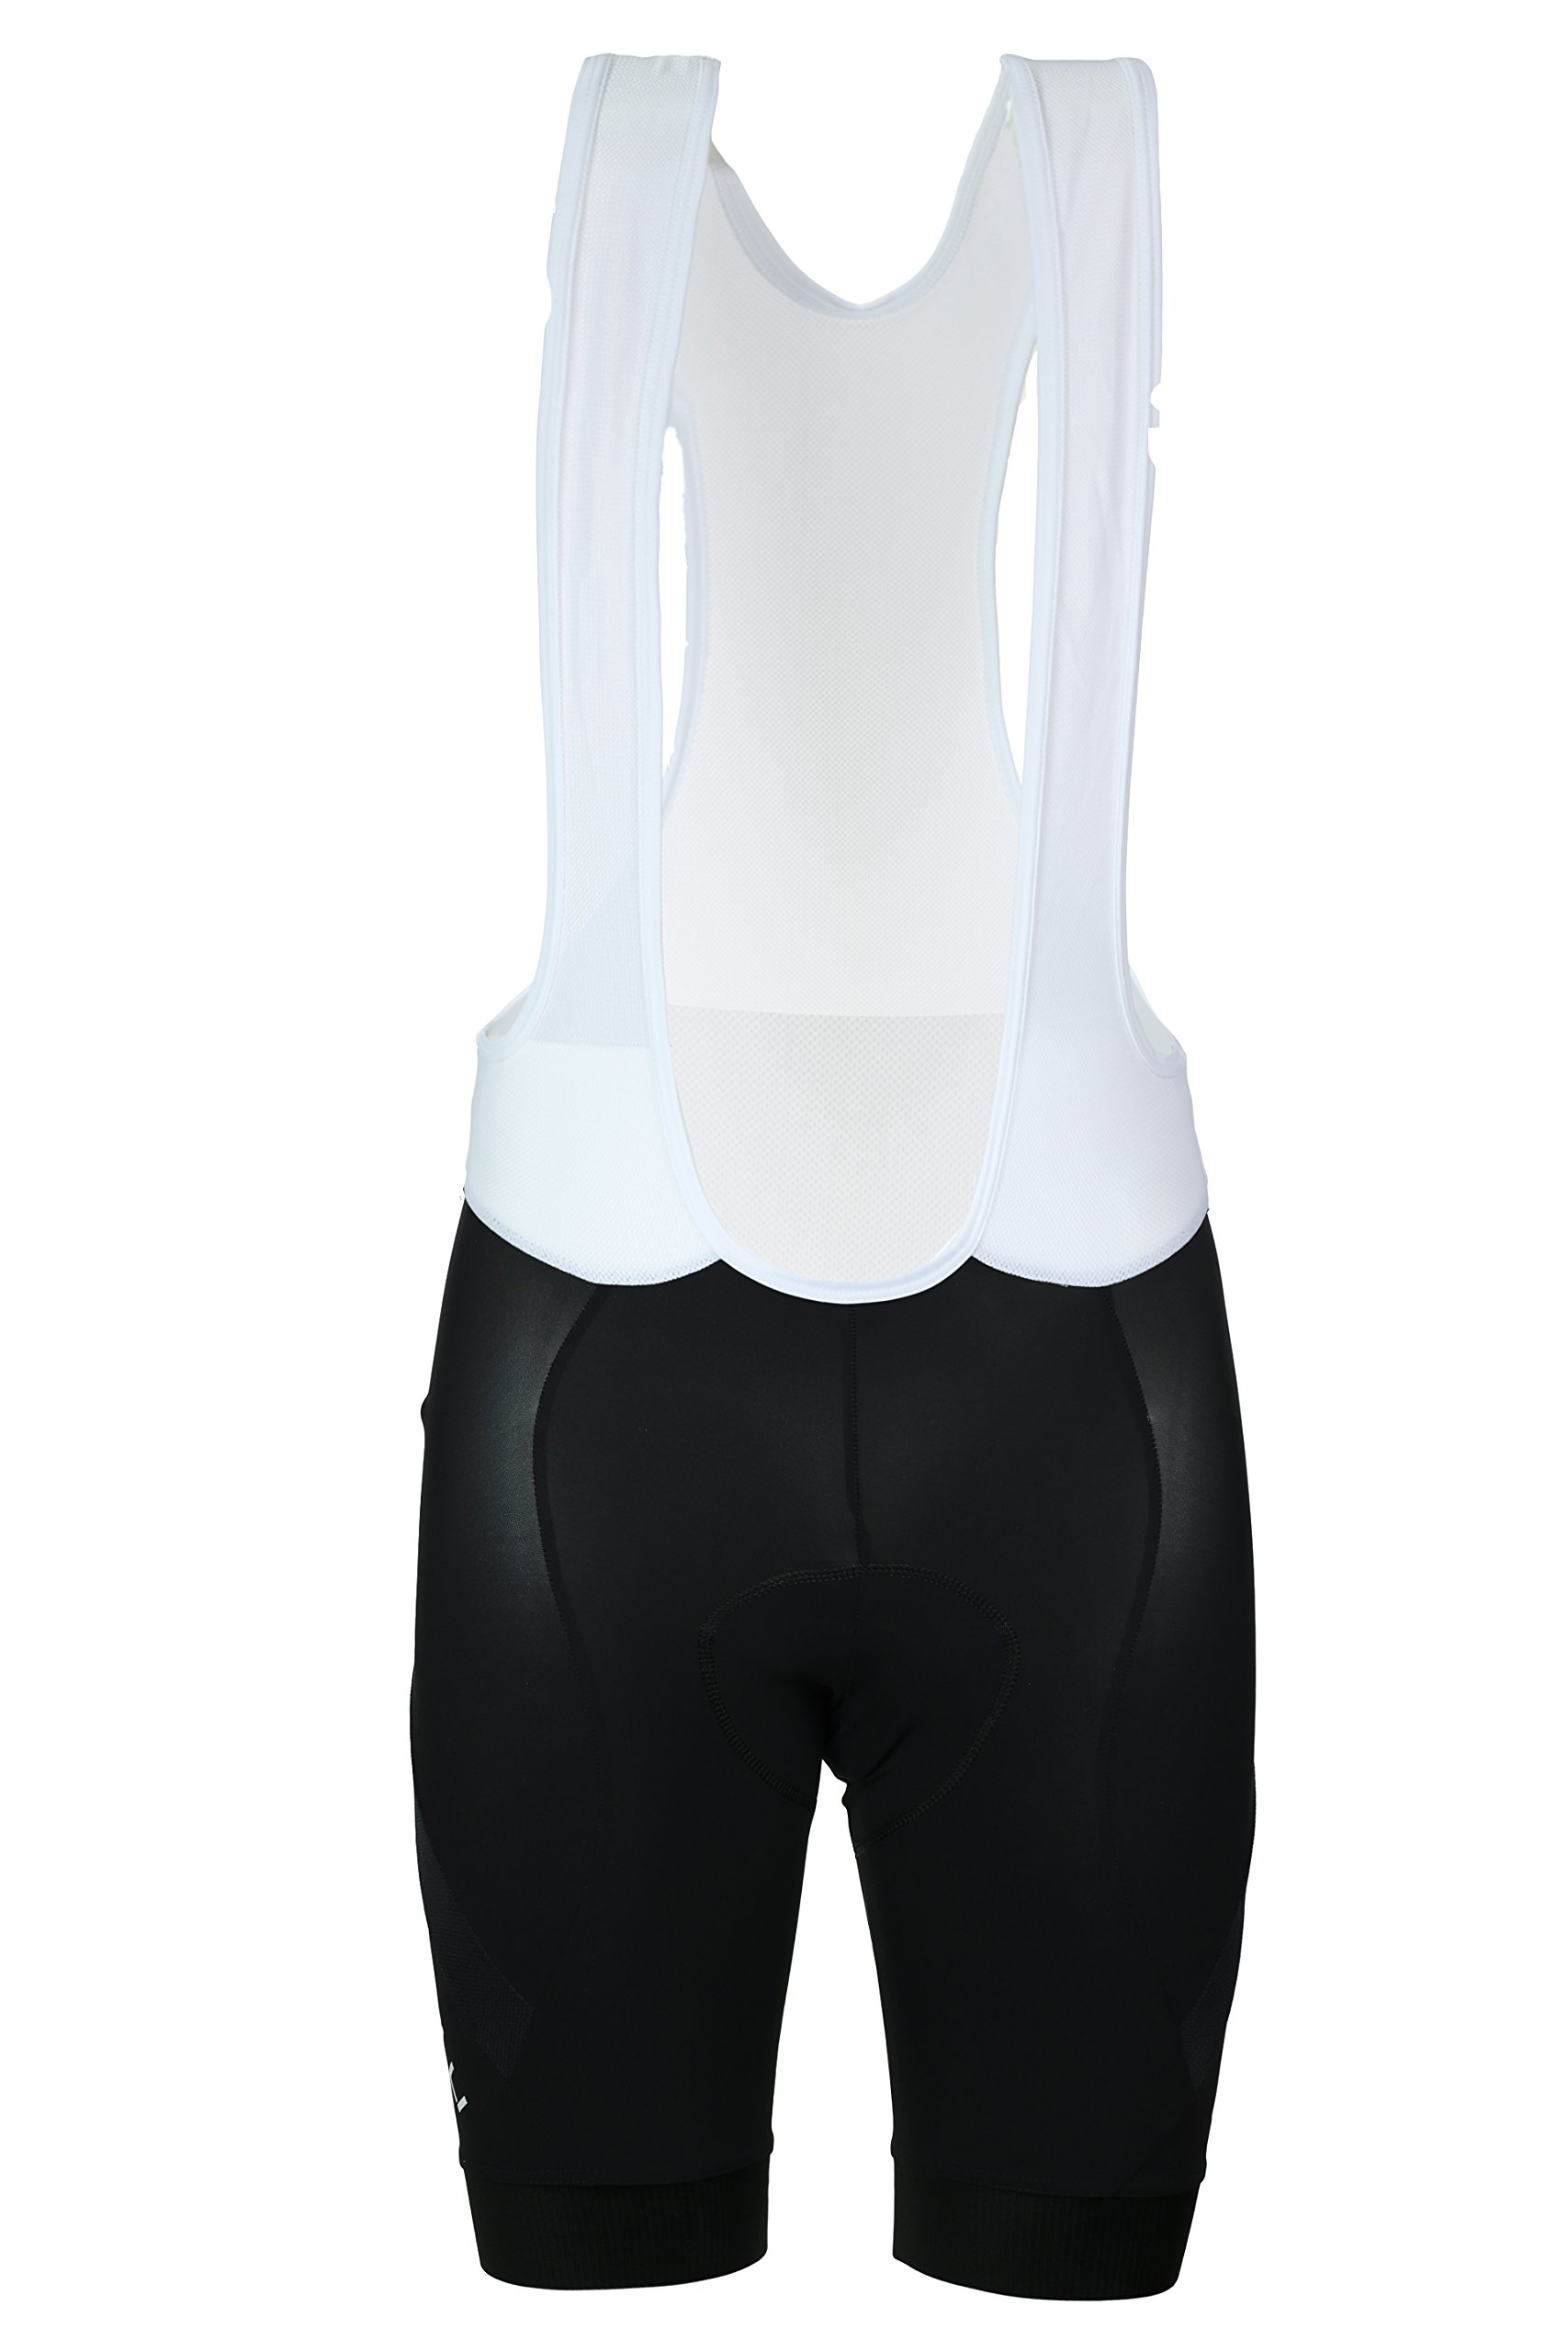 Castelli Endurance X2 Bib Short - Men's Black, L